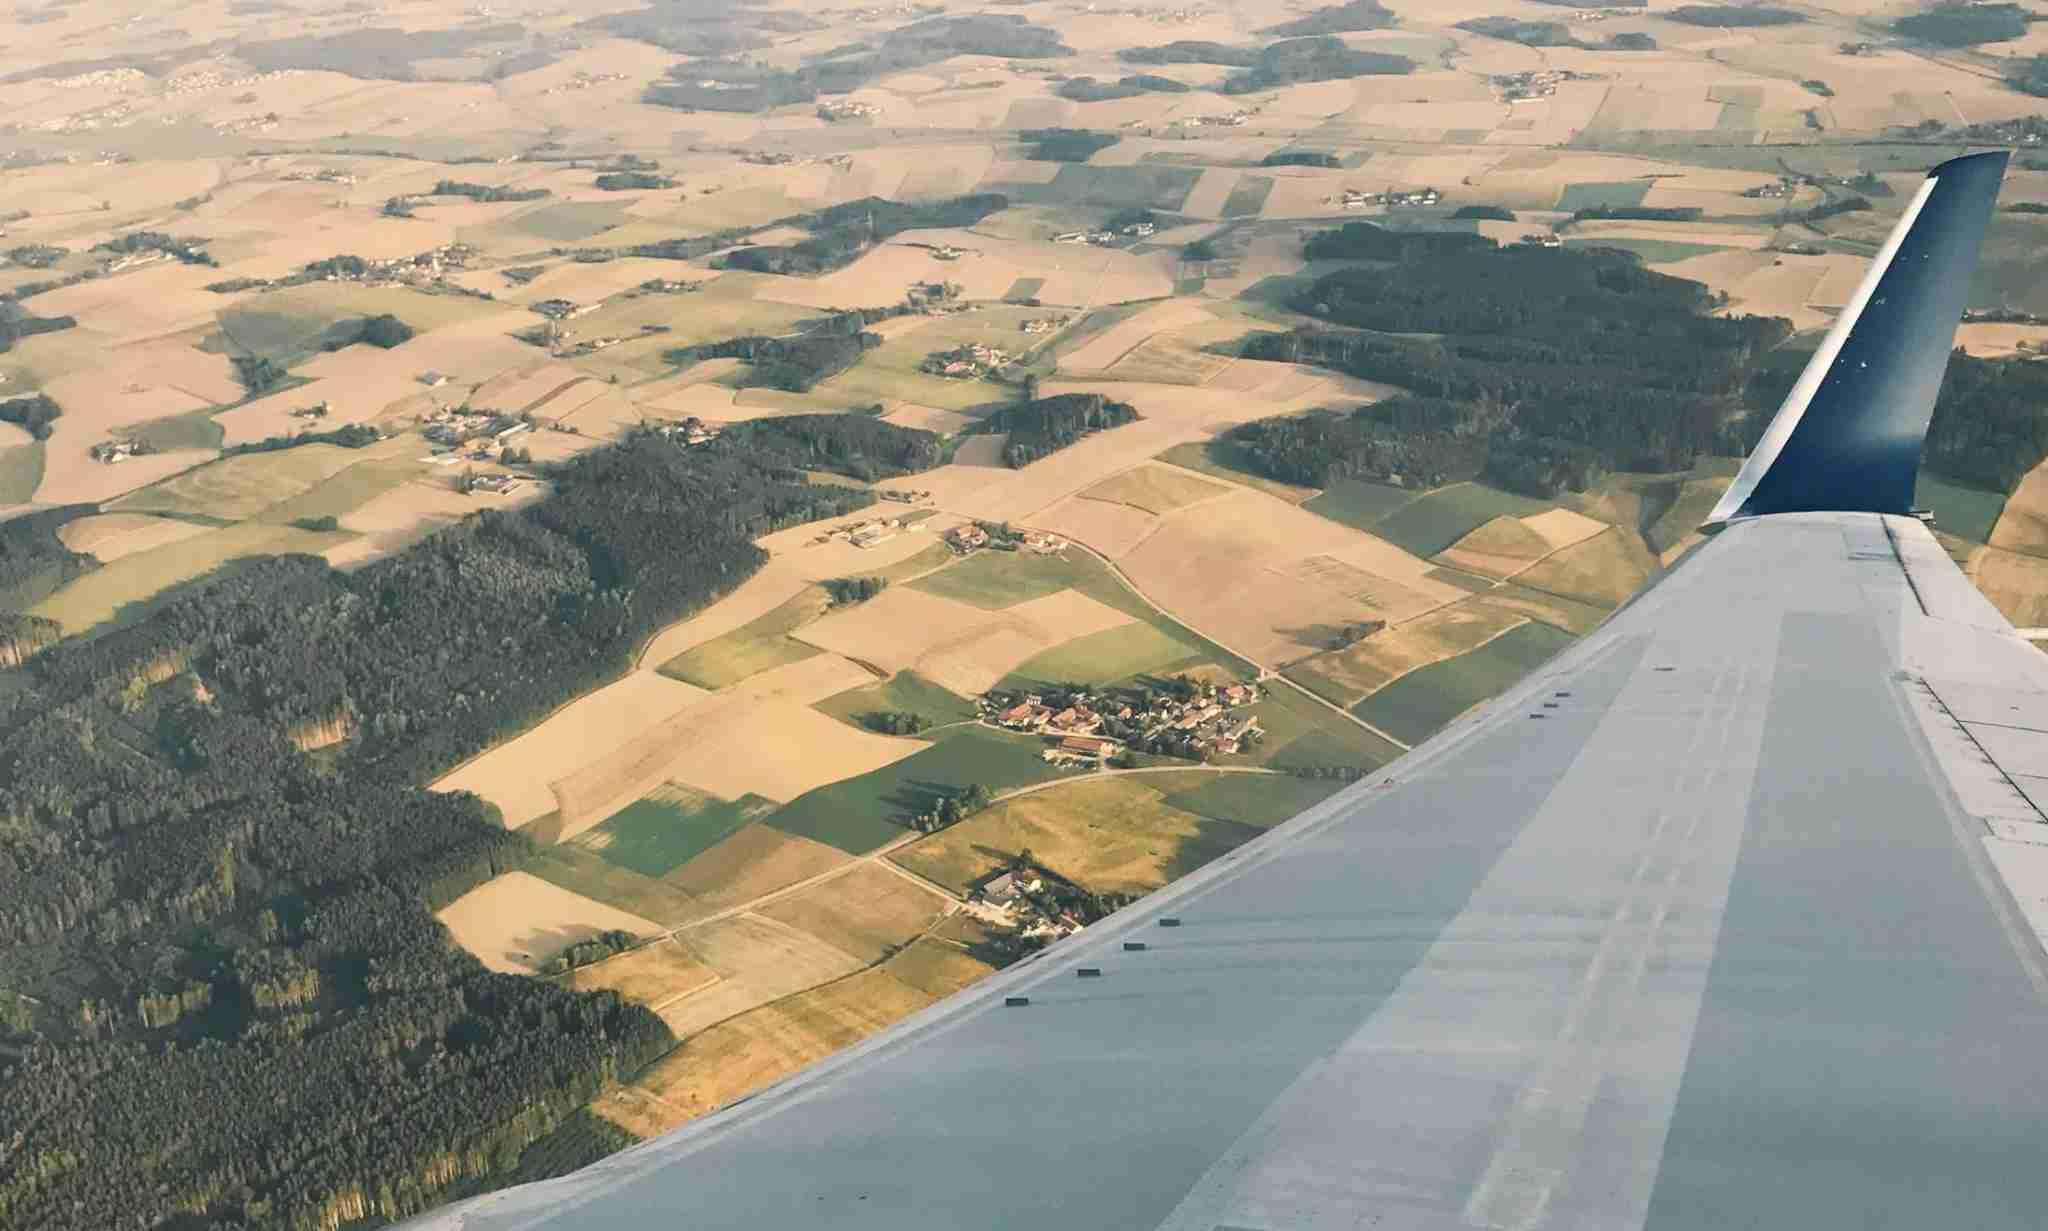 Delta 767 flights over Munich, Germany